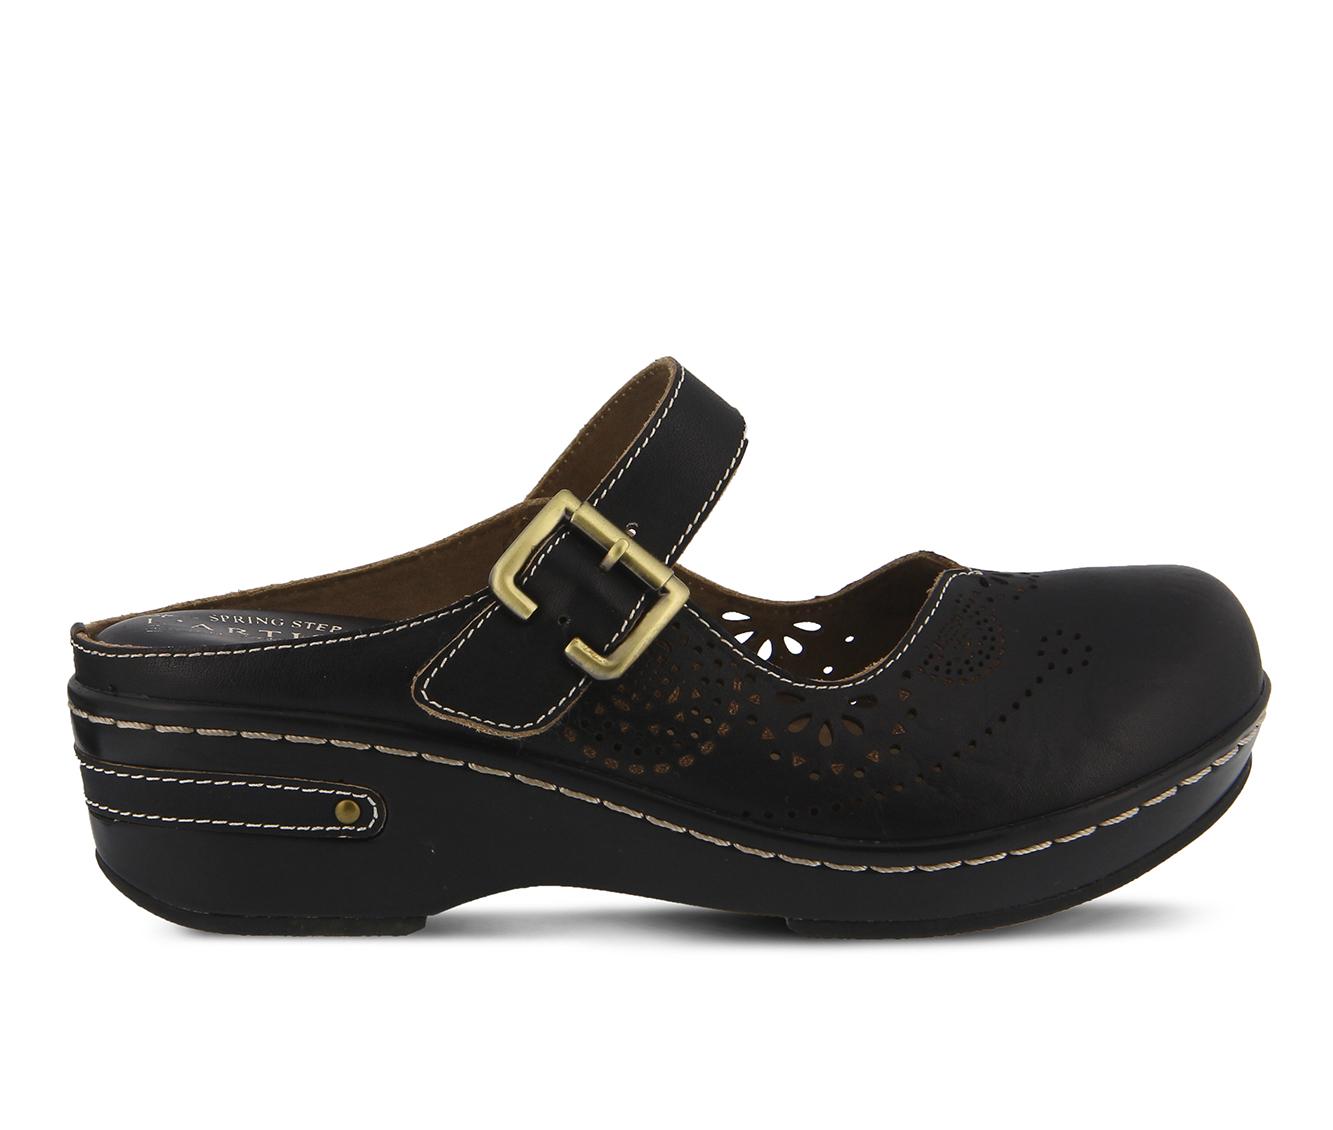 L'Artiste Aneria Women's Shoe (Black Leather)